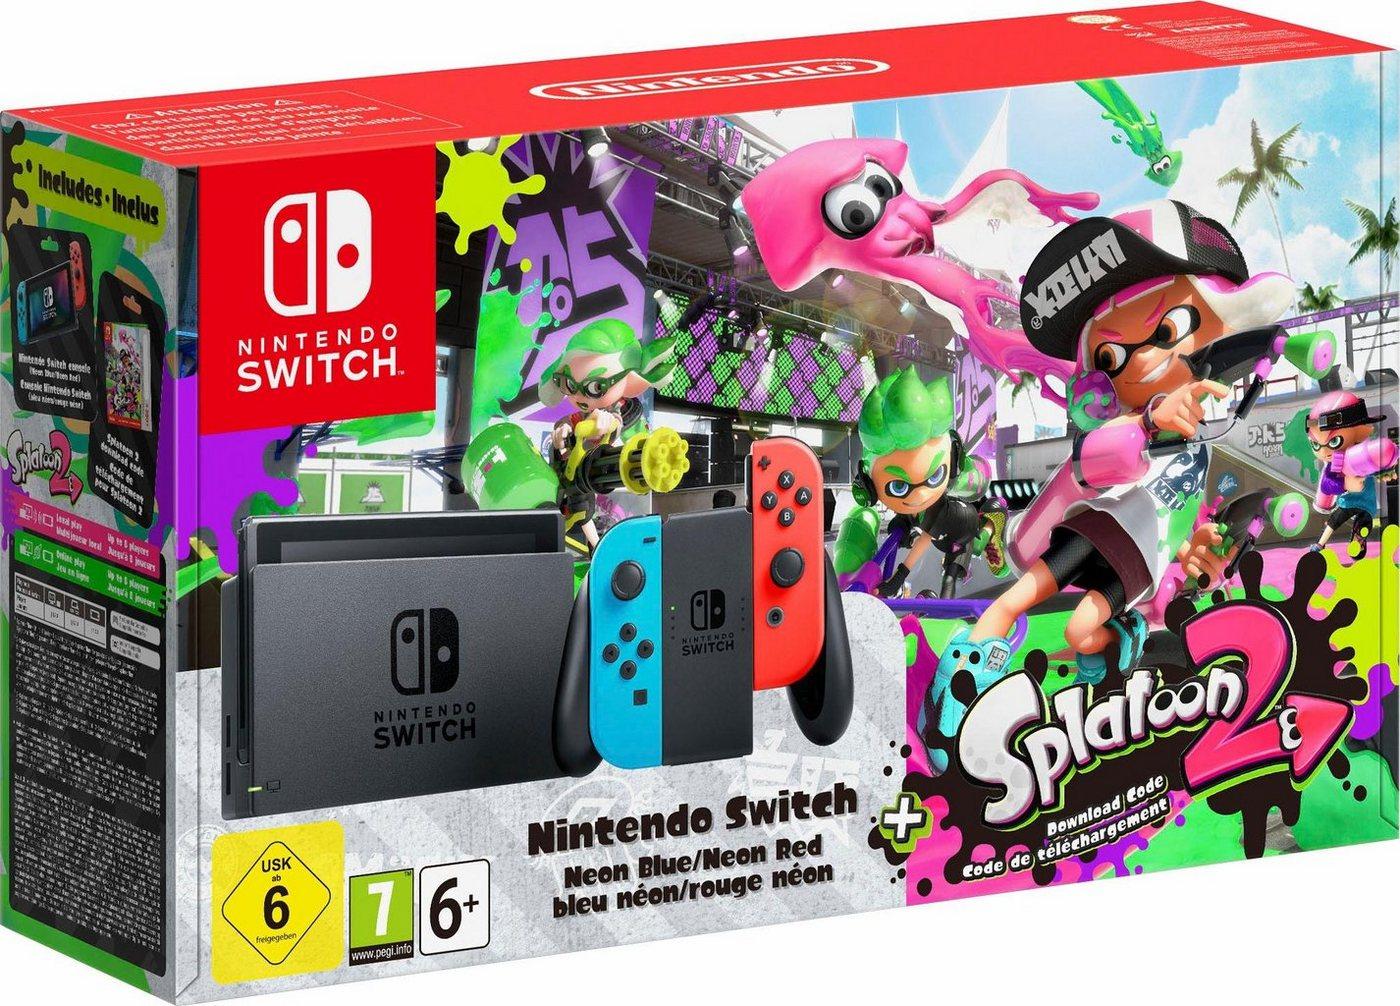 Nintendo Switch-Konsole + Splatoon 2 (DLC) - Preisvergleich